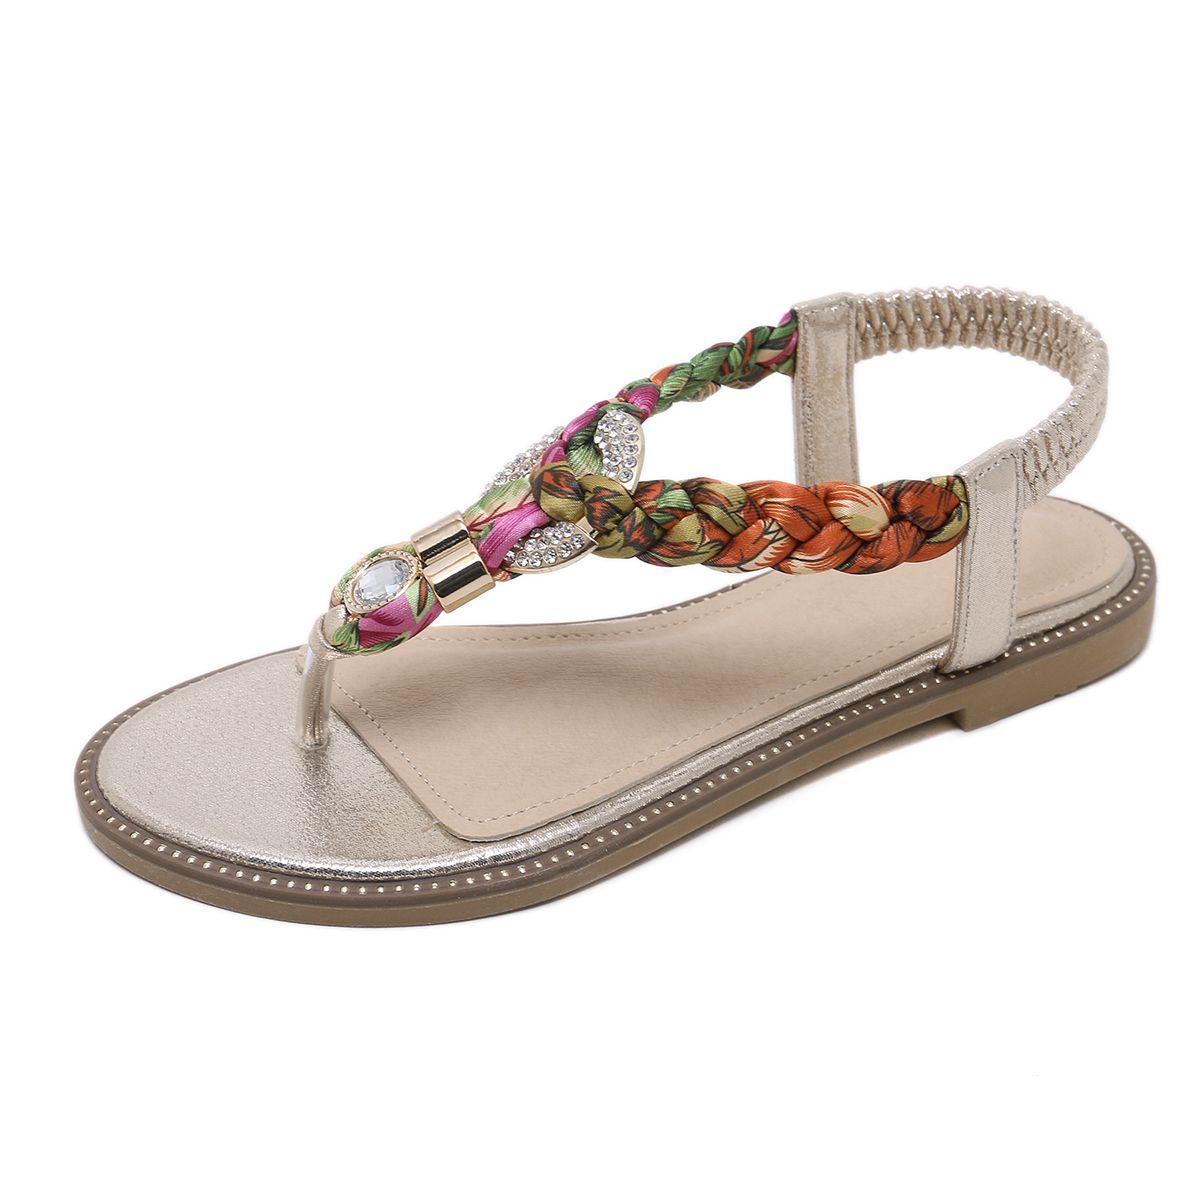 72dc02e1b Thong Sandal For Ladies Bohemia Flip Flop Sandals Walking Comfort ...